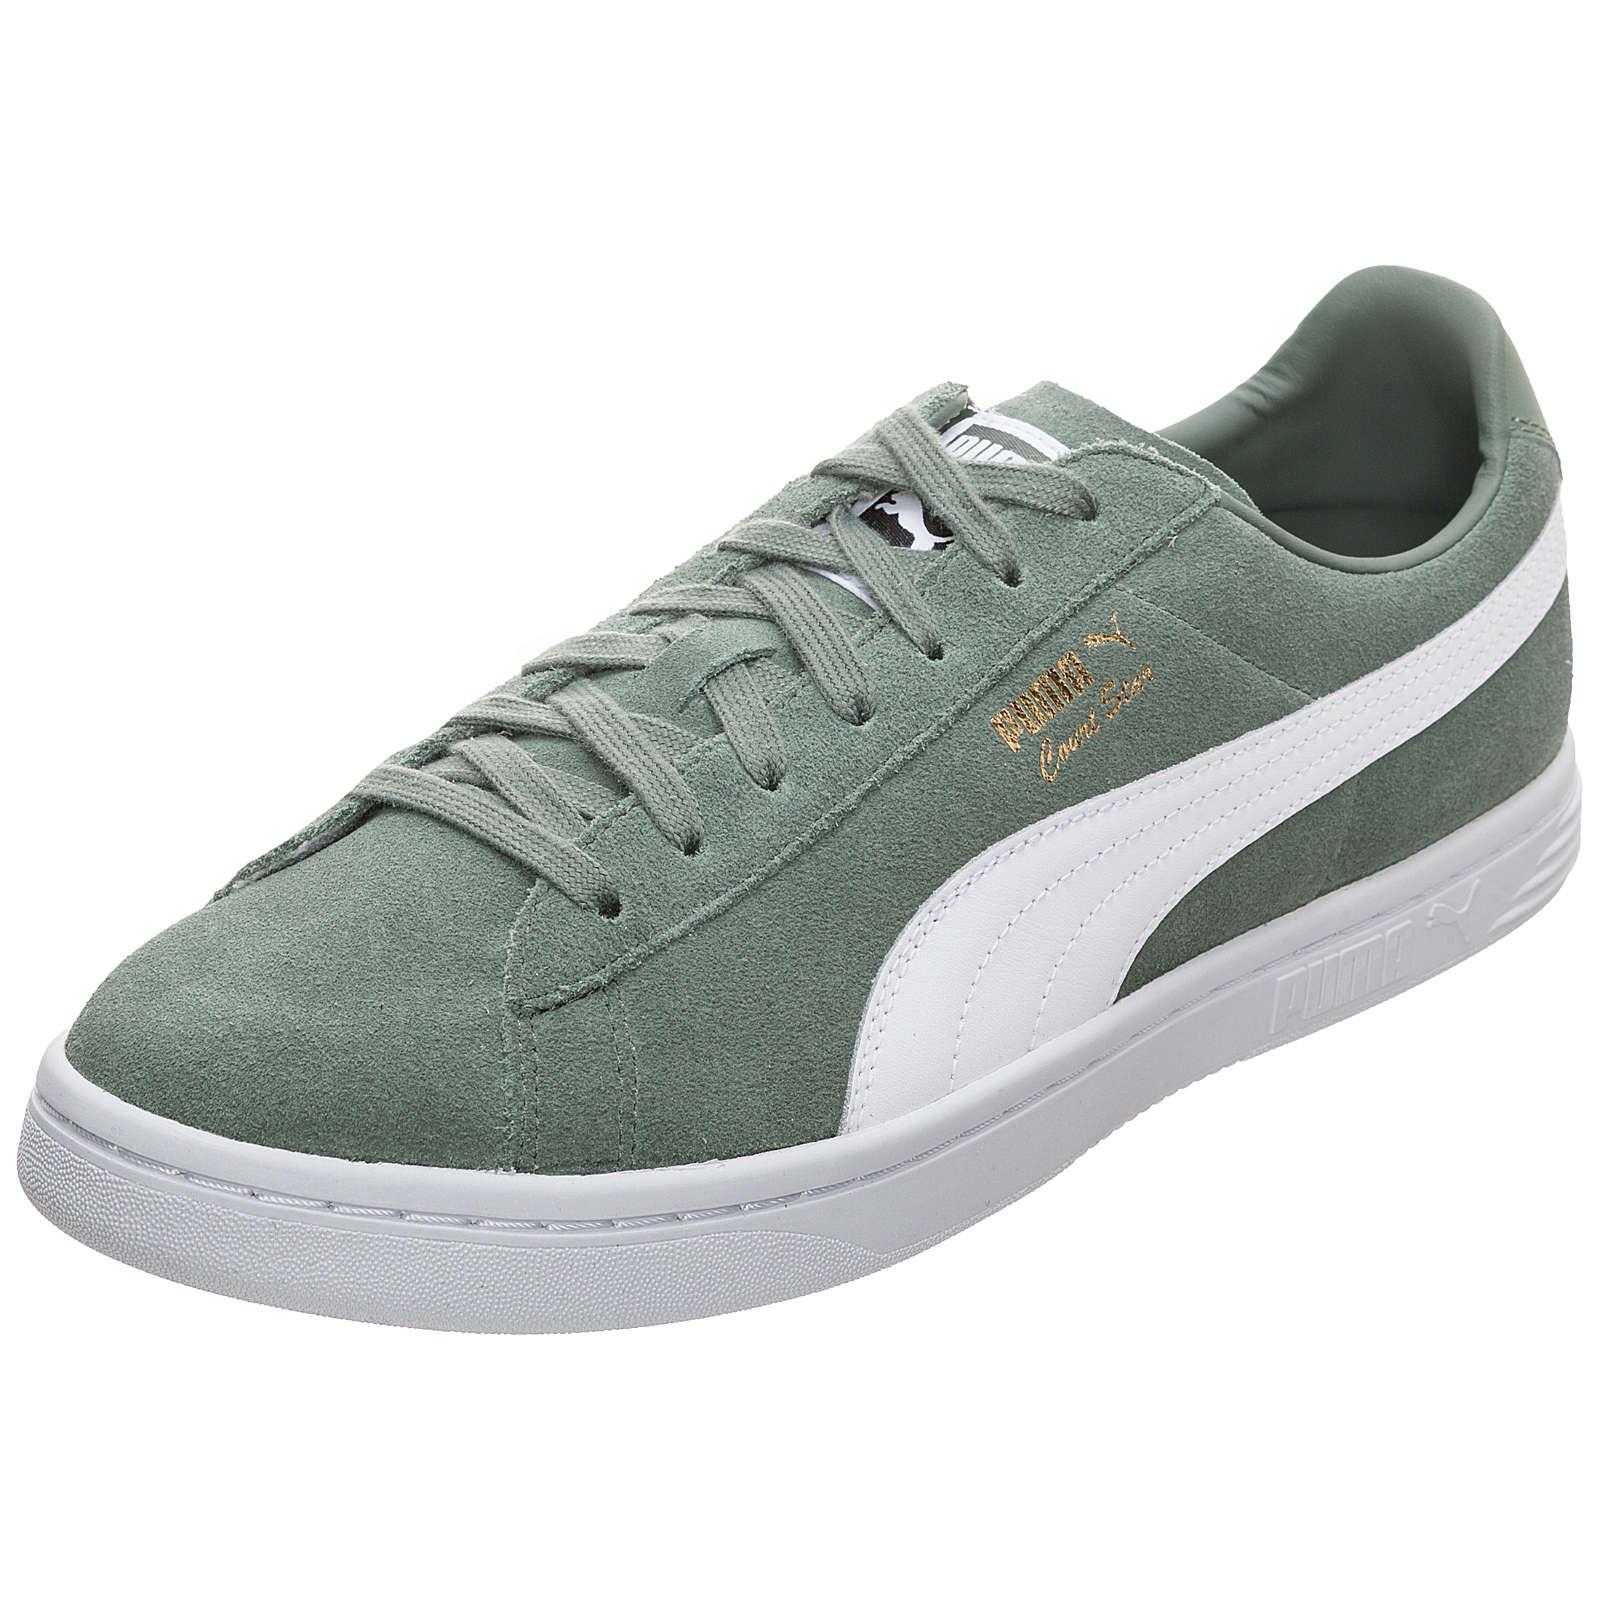 PUMA Court Star FS Sneaker grün Gr. 44,5